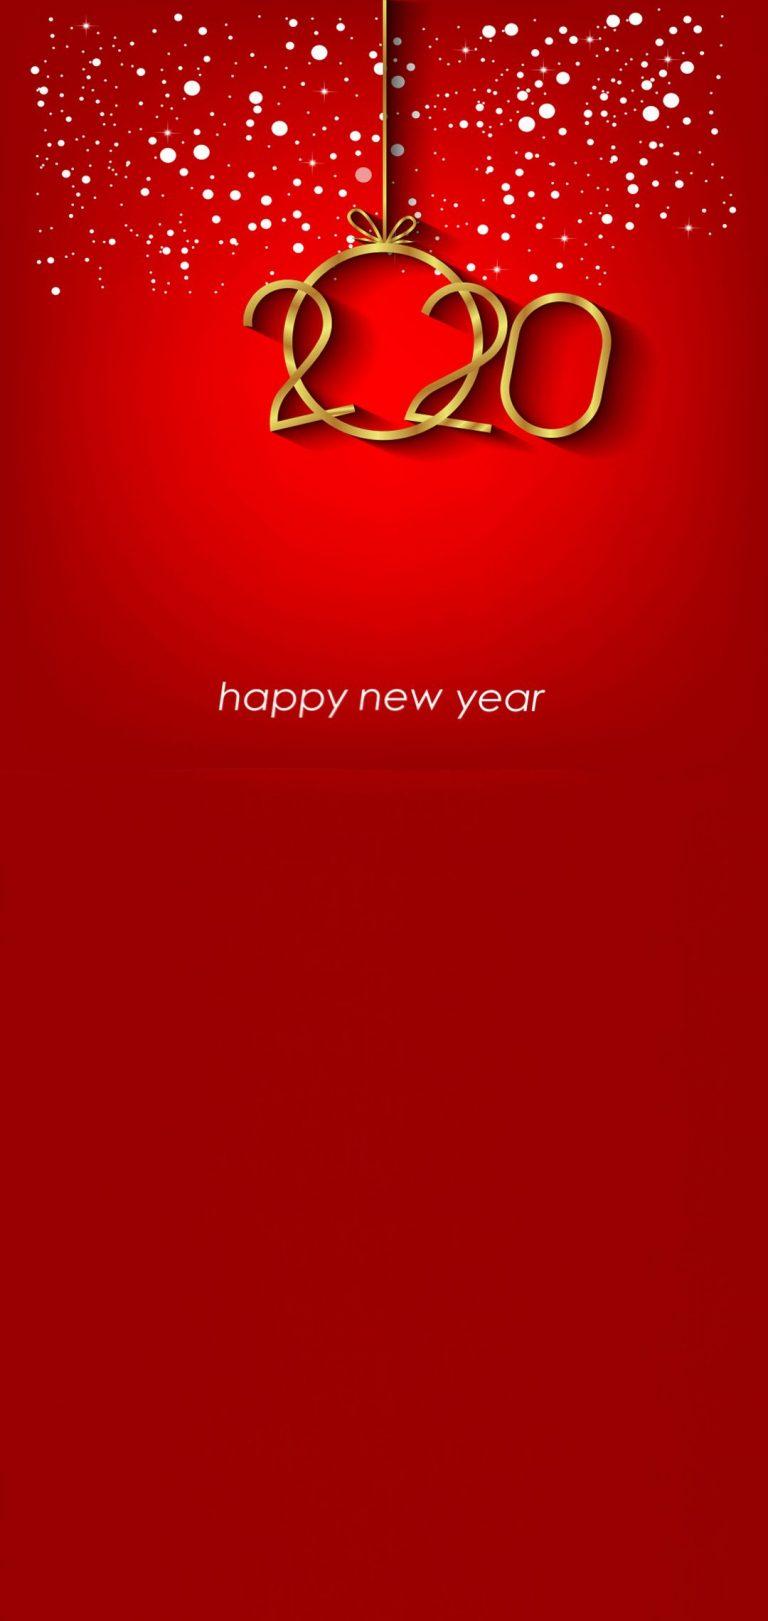 Happy New Year 2020 Phone Wallpaper 02 - [1080x2280]